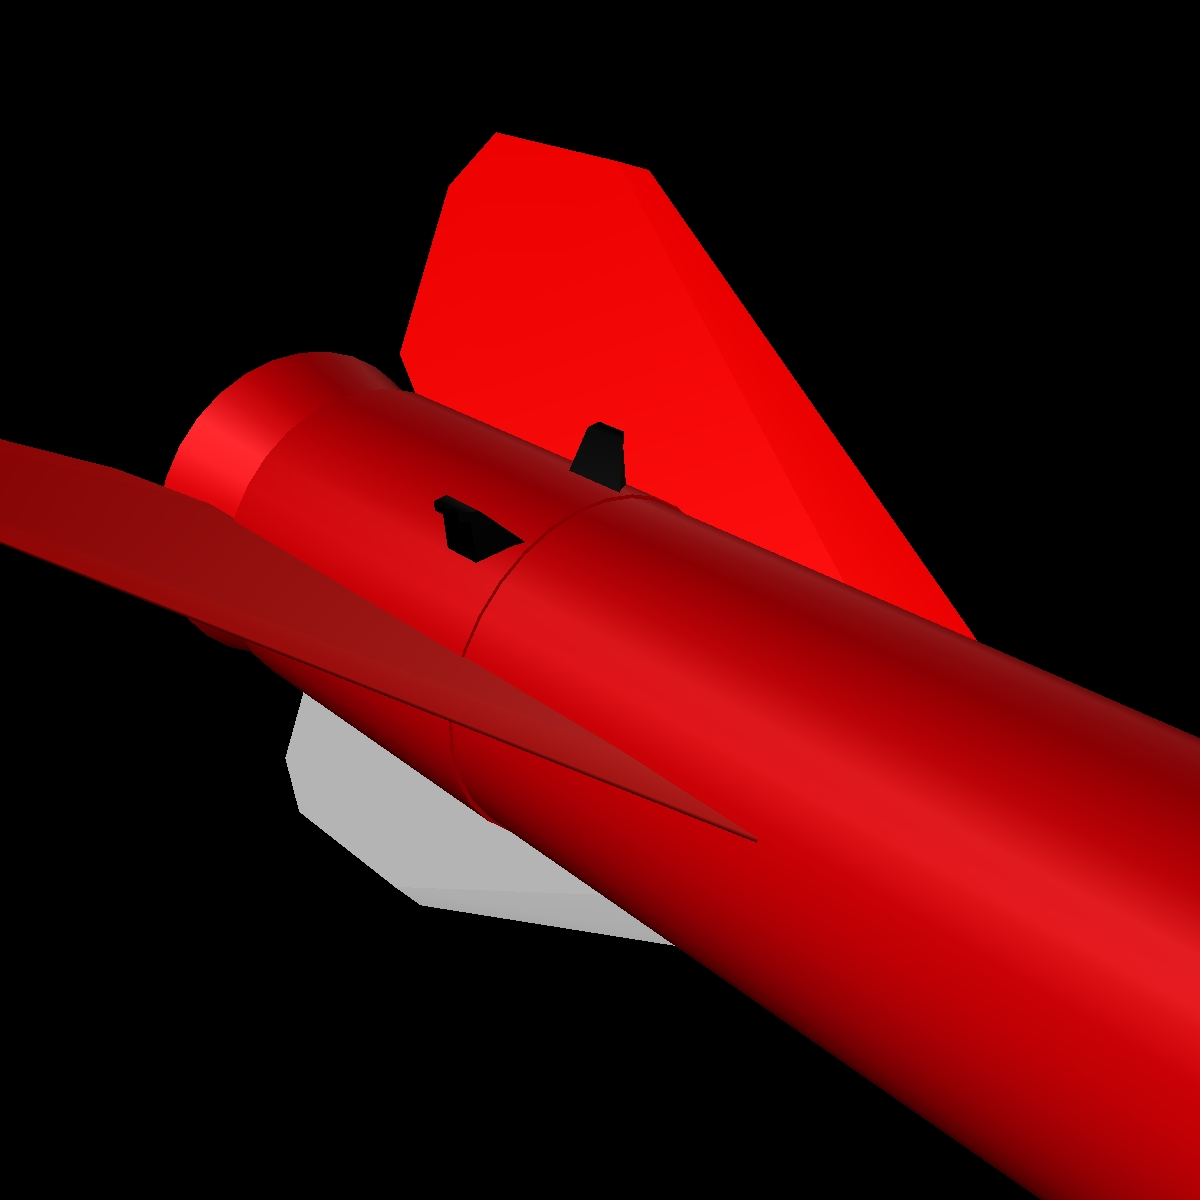 хар хун III пуужин 3d загвар 3ds дууг сонсогдож dxf cob x obj 150824